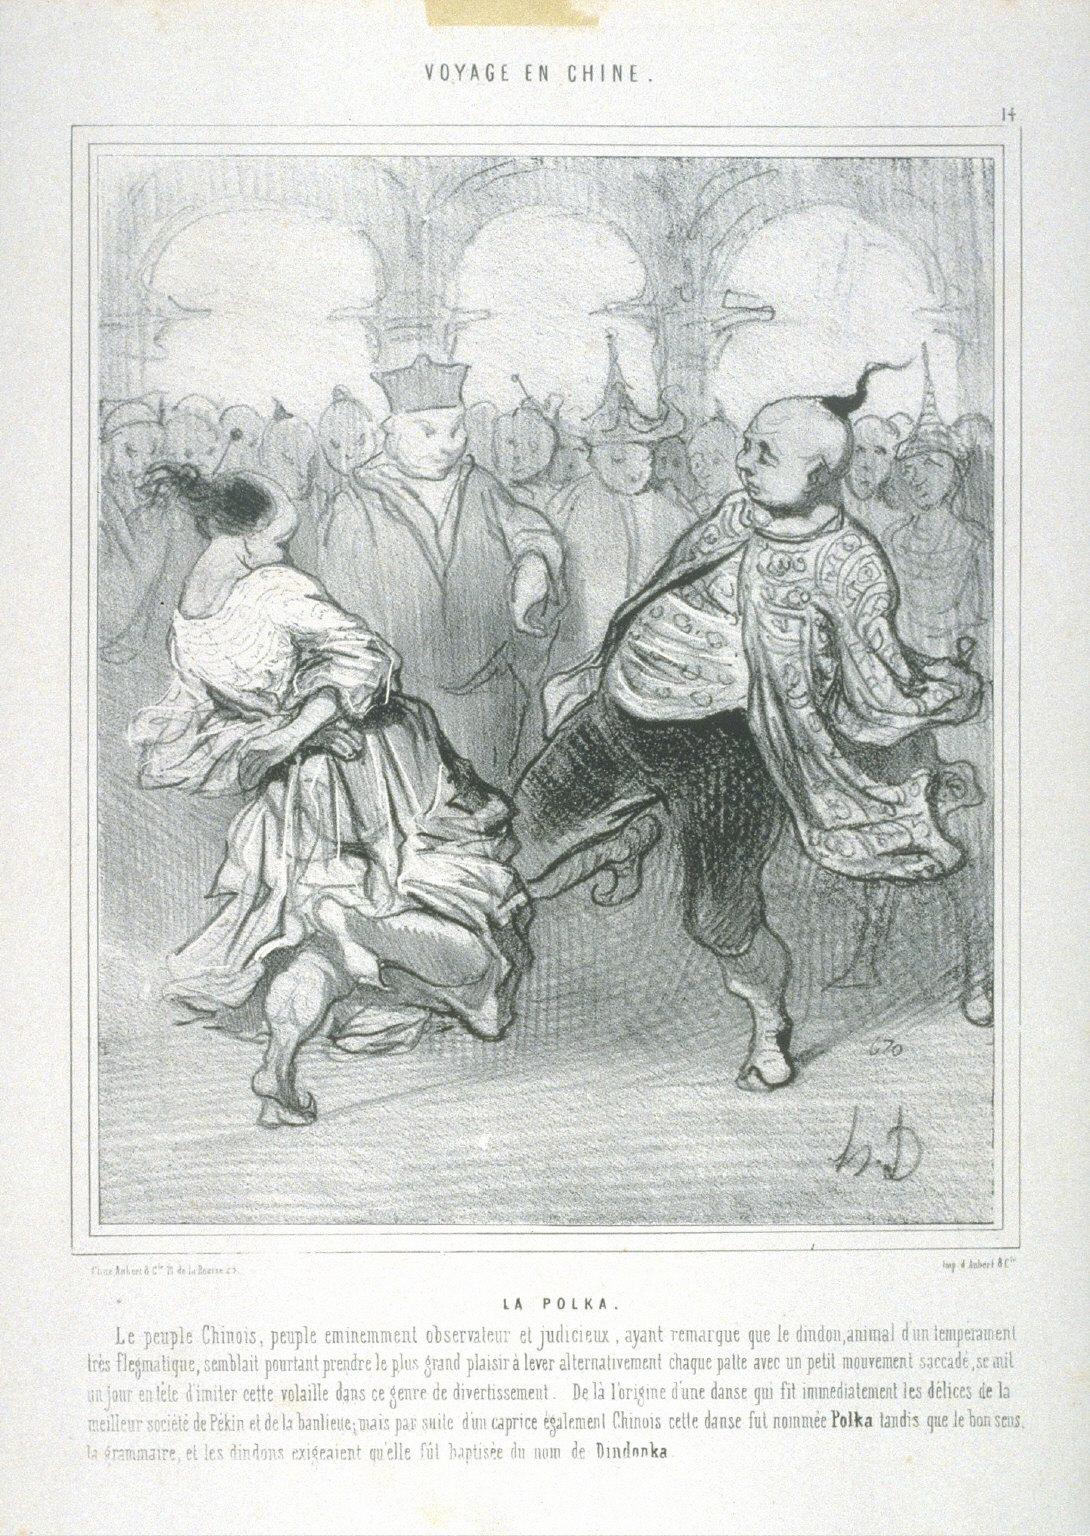 LA POLKA, no. 14 from the series, VOYAGE EN CHINE